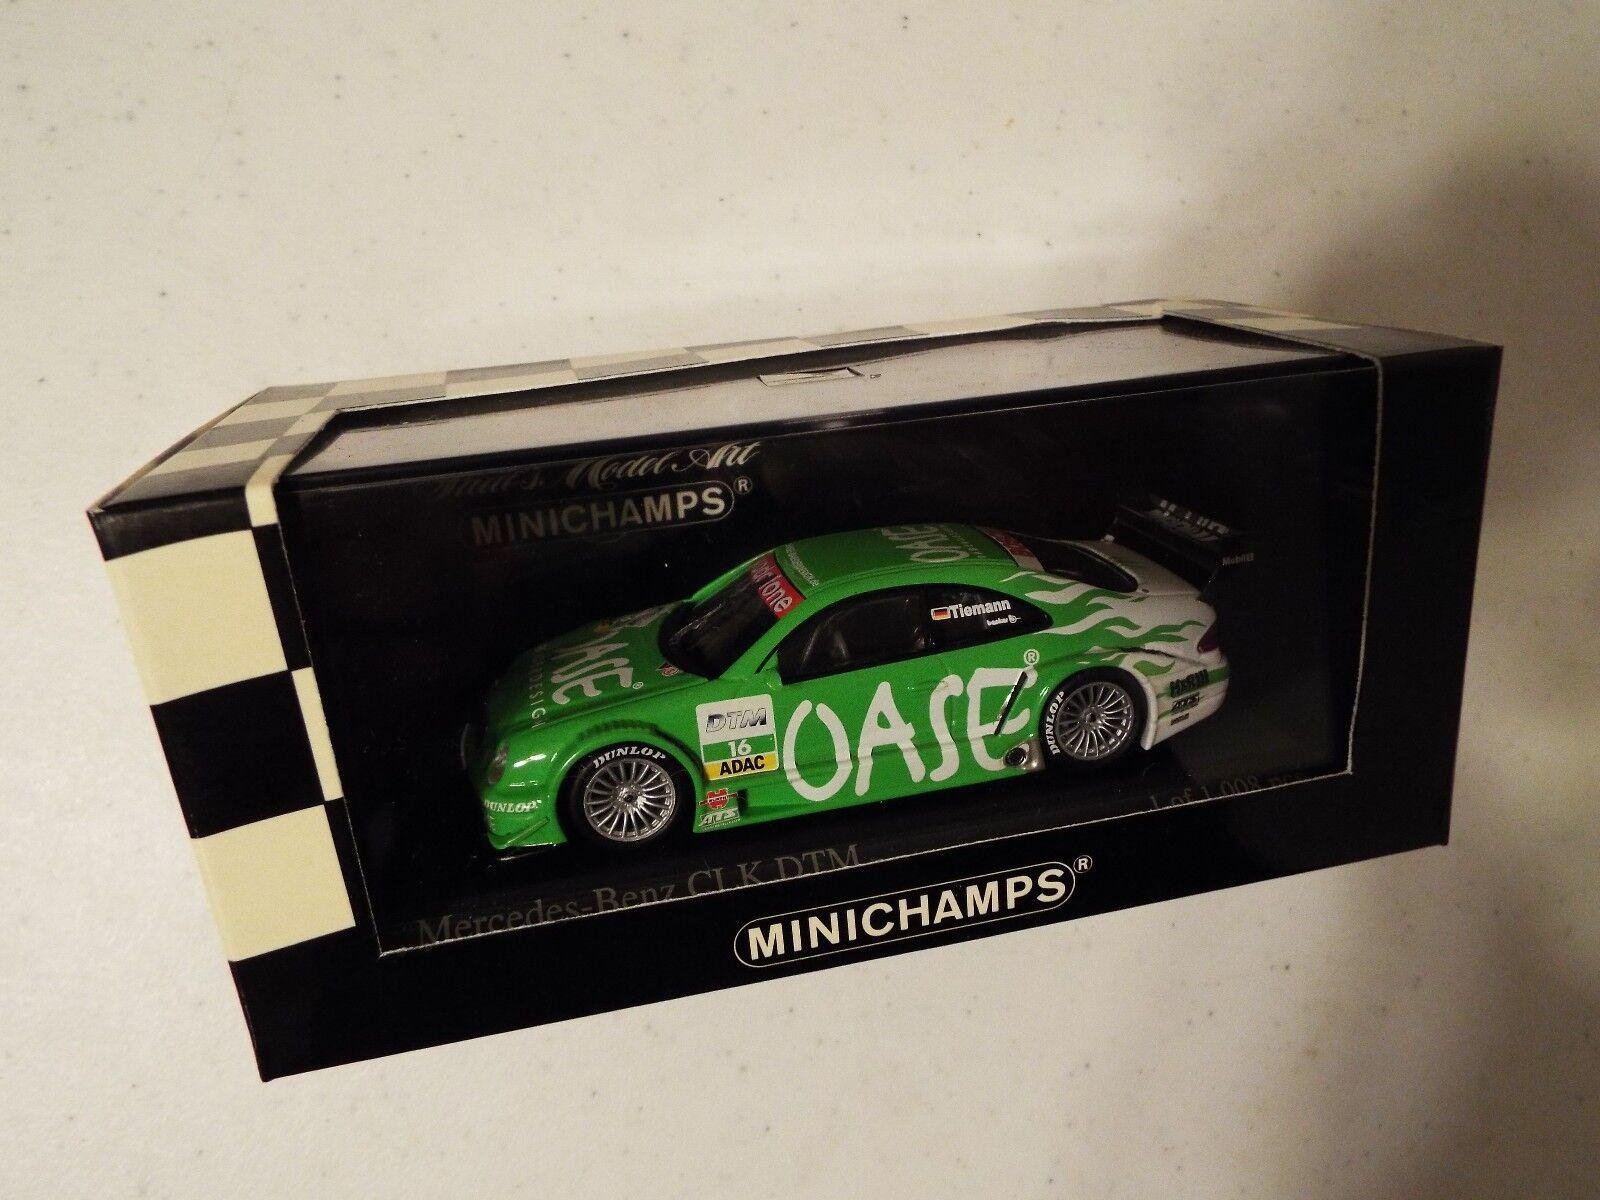 Minichamps 1 43 Mercedes CLK Coupe Dtm 2001 sumidos equipo Oase AMG OVP